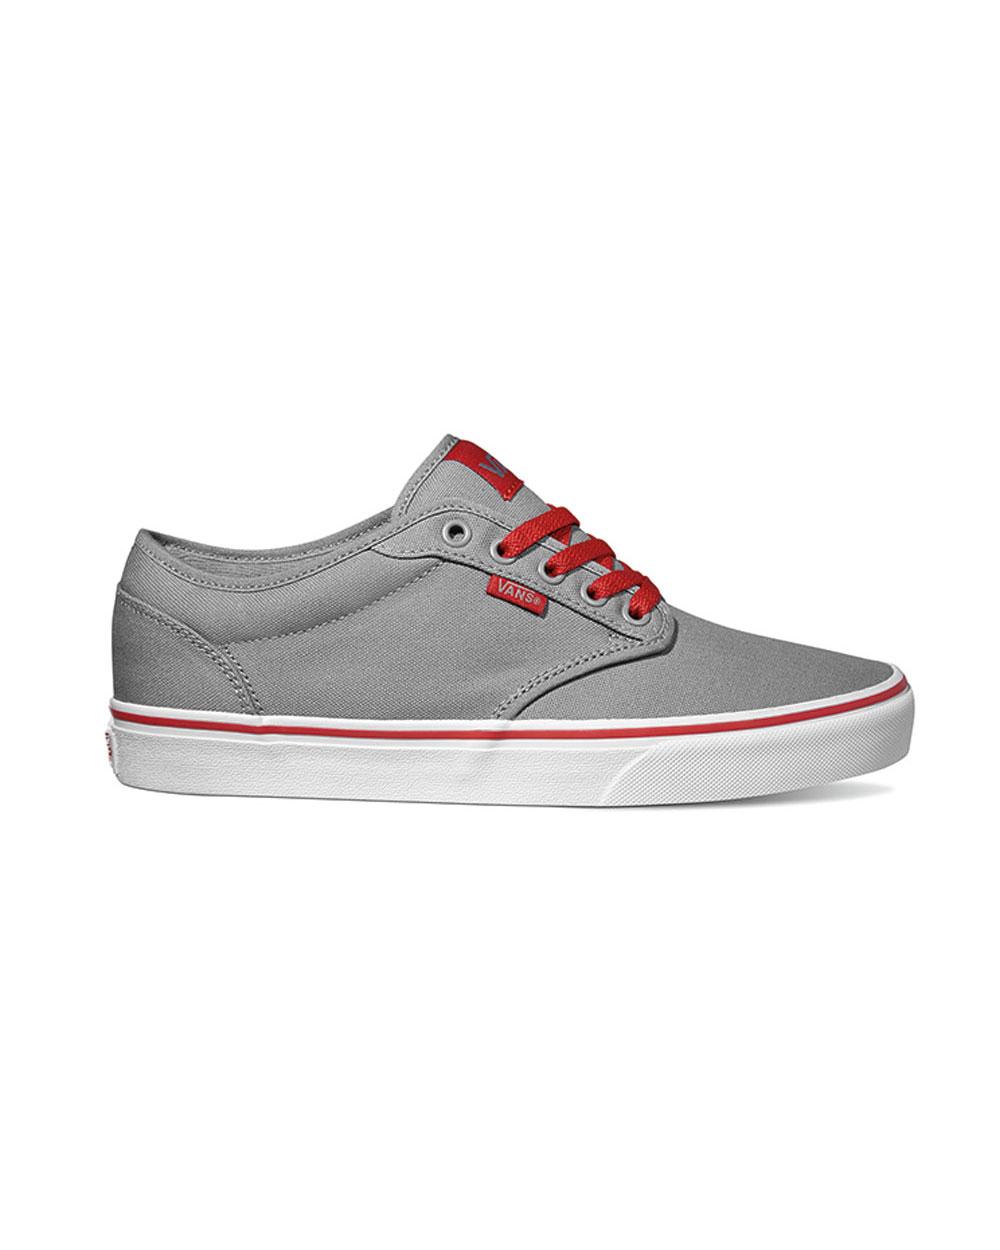 Vans Atwood Retro Varsity (frost gray/red)